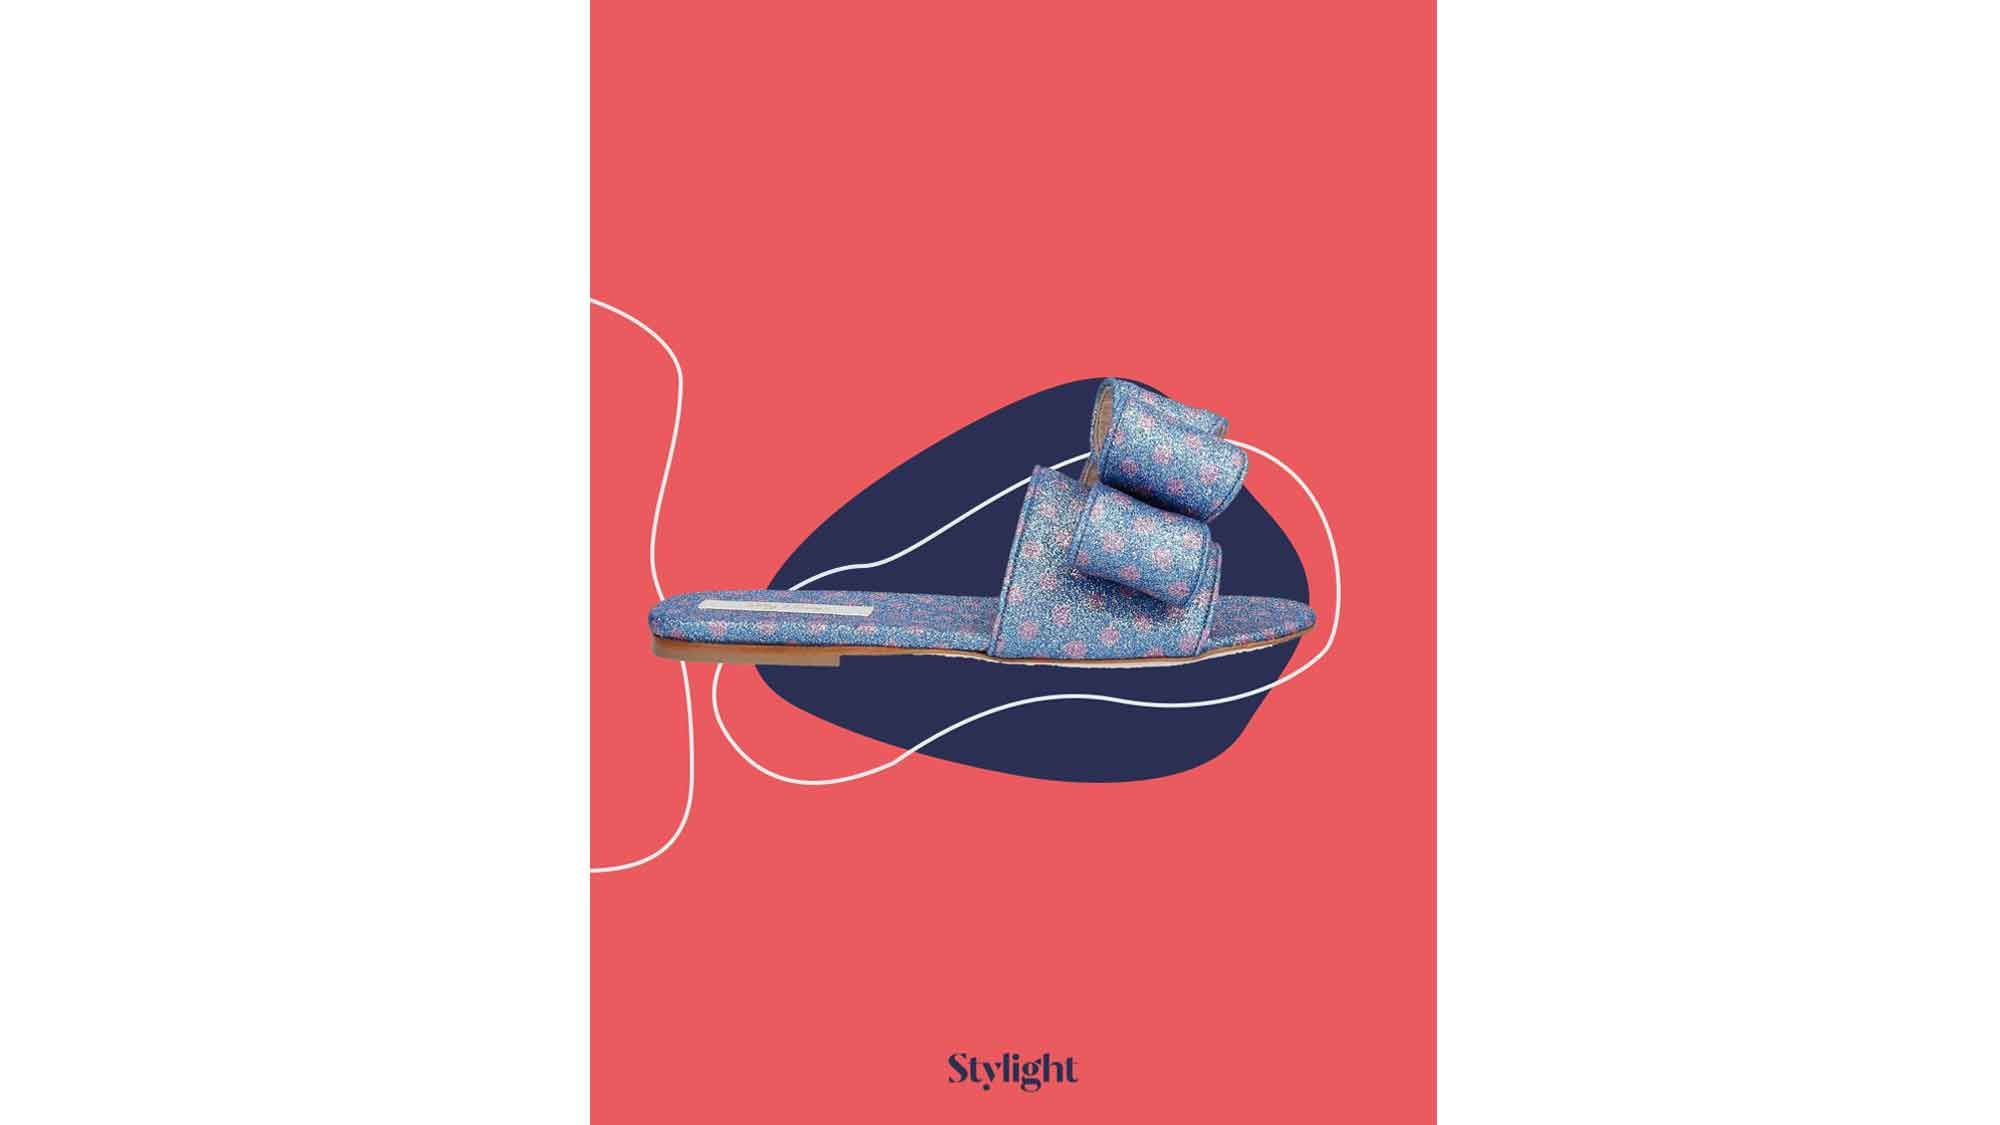 stylight-sandalenschleife.jpg